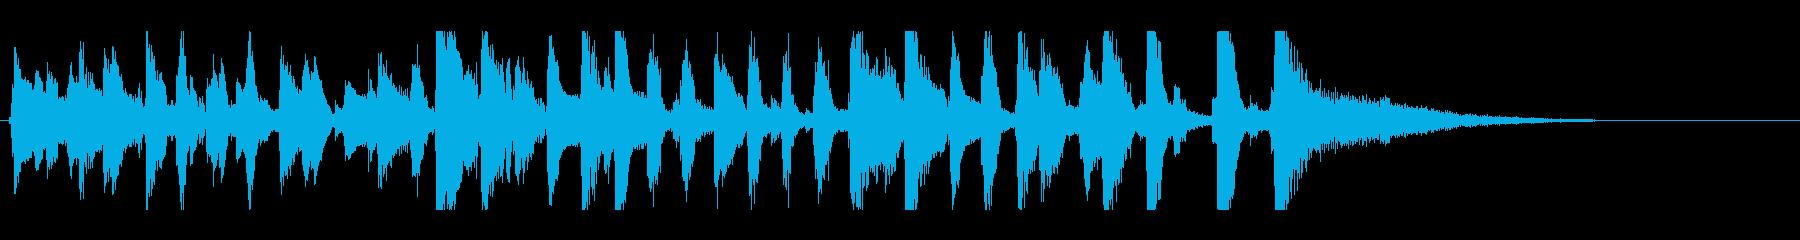 YouTube、明るいピアノレトロジャズの再生済みの波形